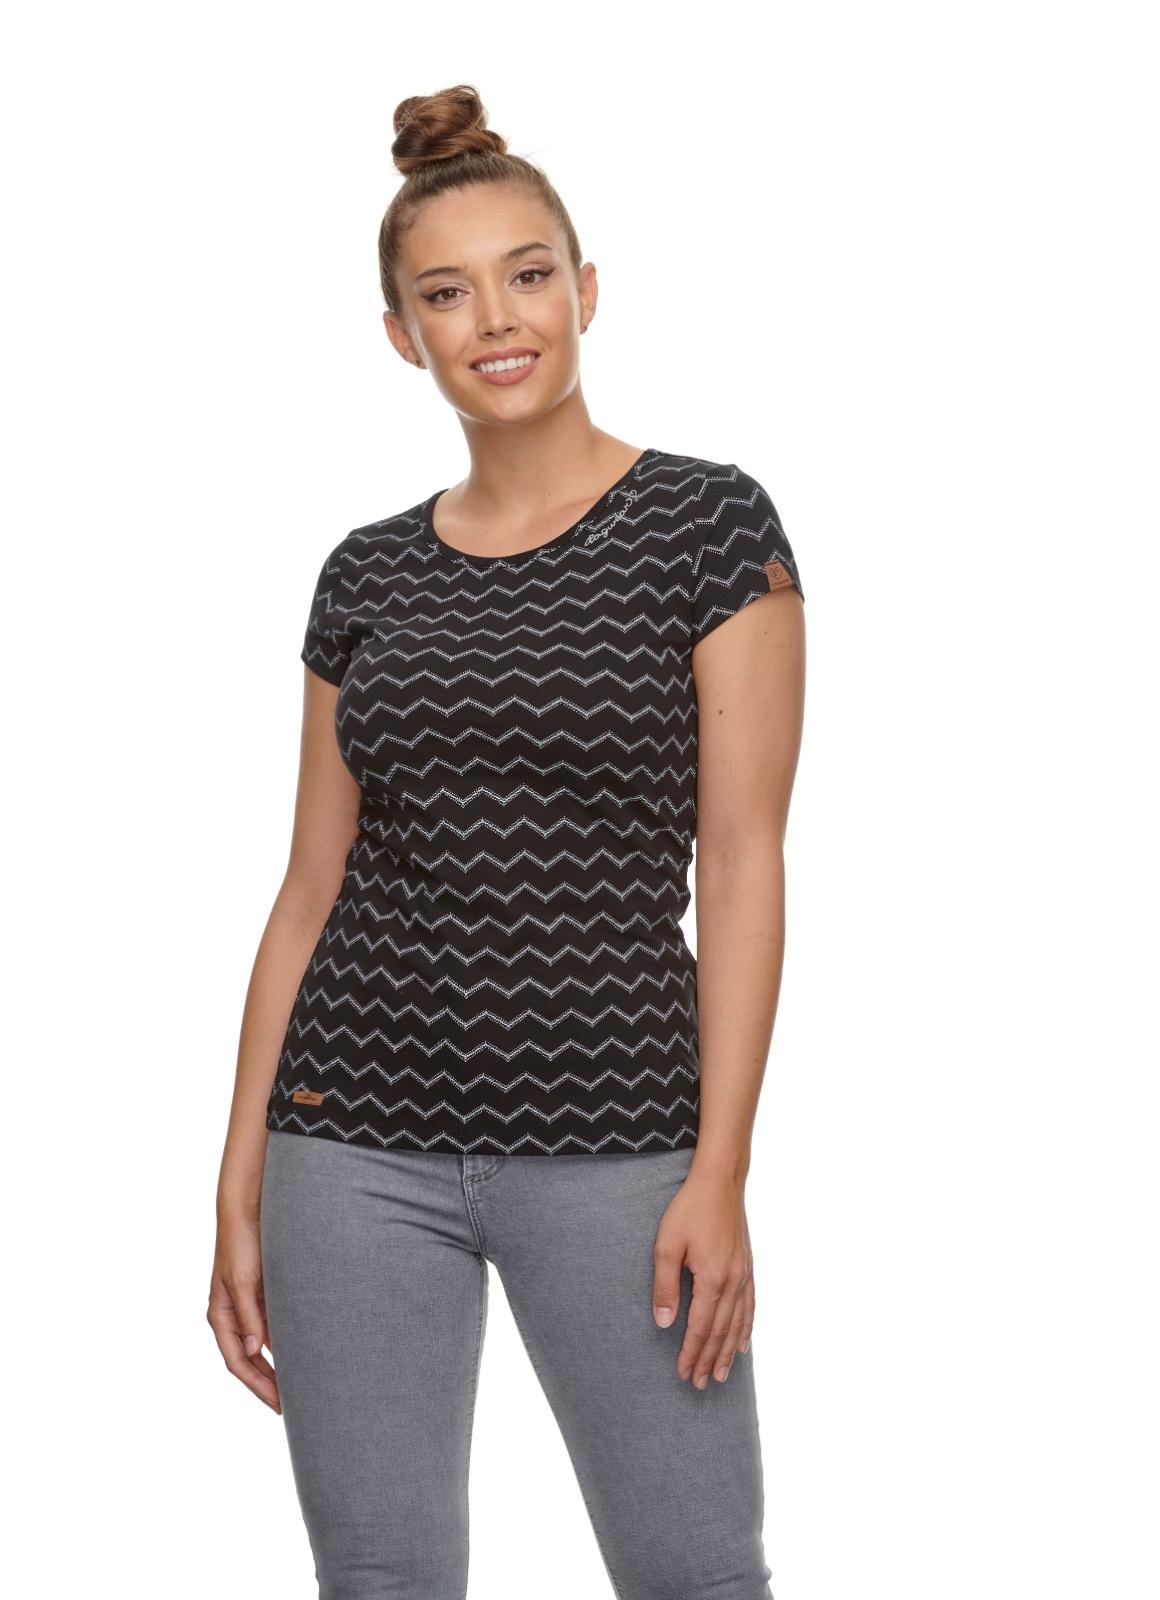 Ragwear Damen T-Shirt Mint Chevron schwarz weiß gemustert 2111 10014 1010 black